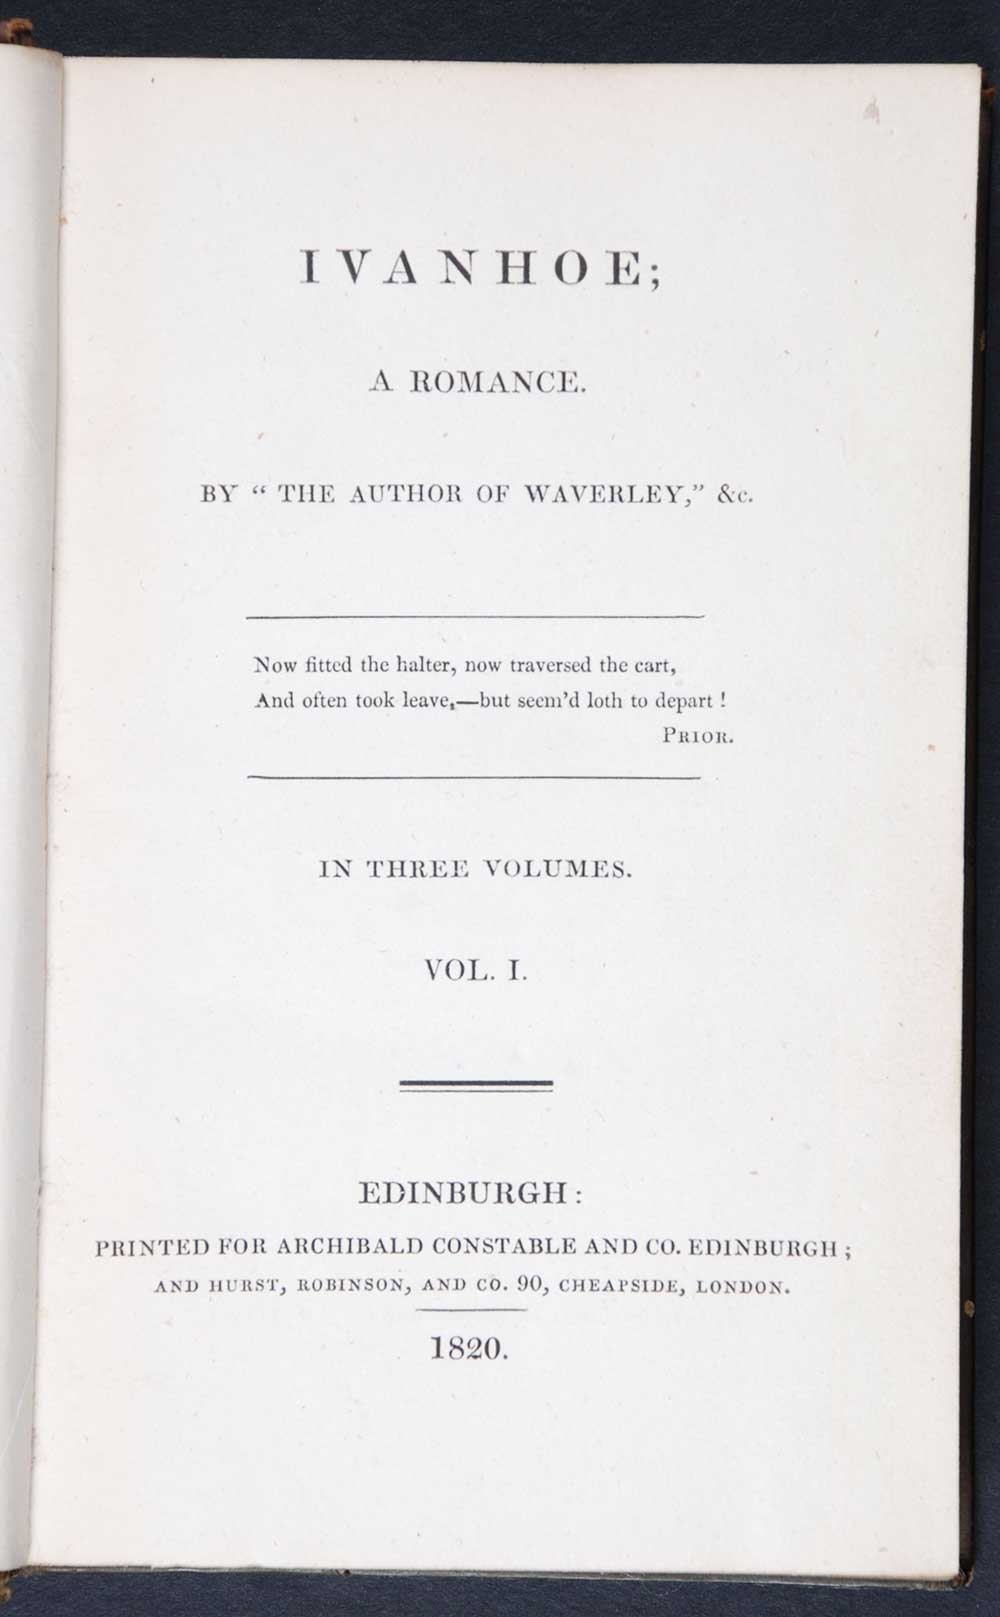 [Sir Walter Scott]. <em>Ivanhoe: a romance.</em> [1st edition]. Edinburgh: Printed for Archibald Constable and Co., Edinburgh; and Hurst, Robinson, and Co., London, 1820. Three volumes; Vol. 1 displayed.